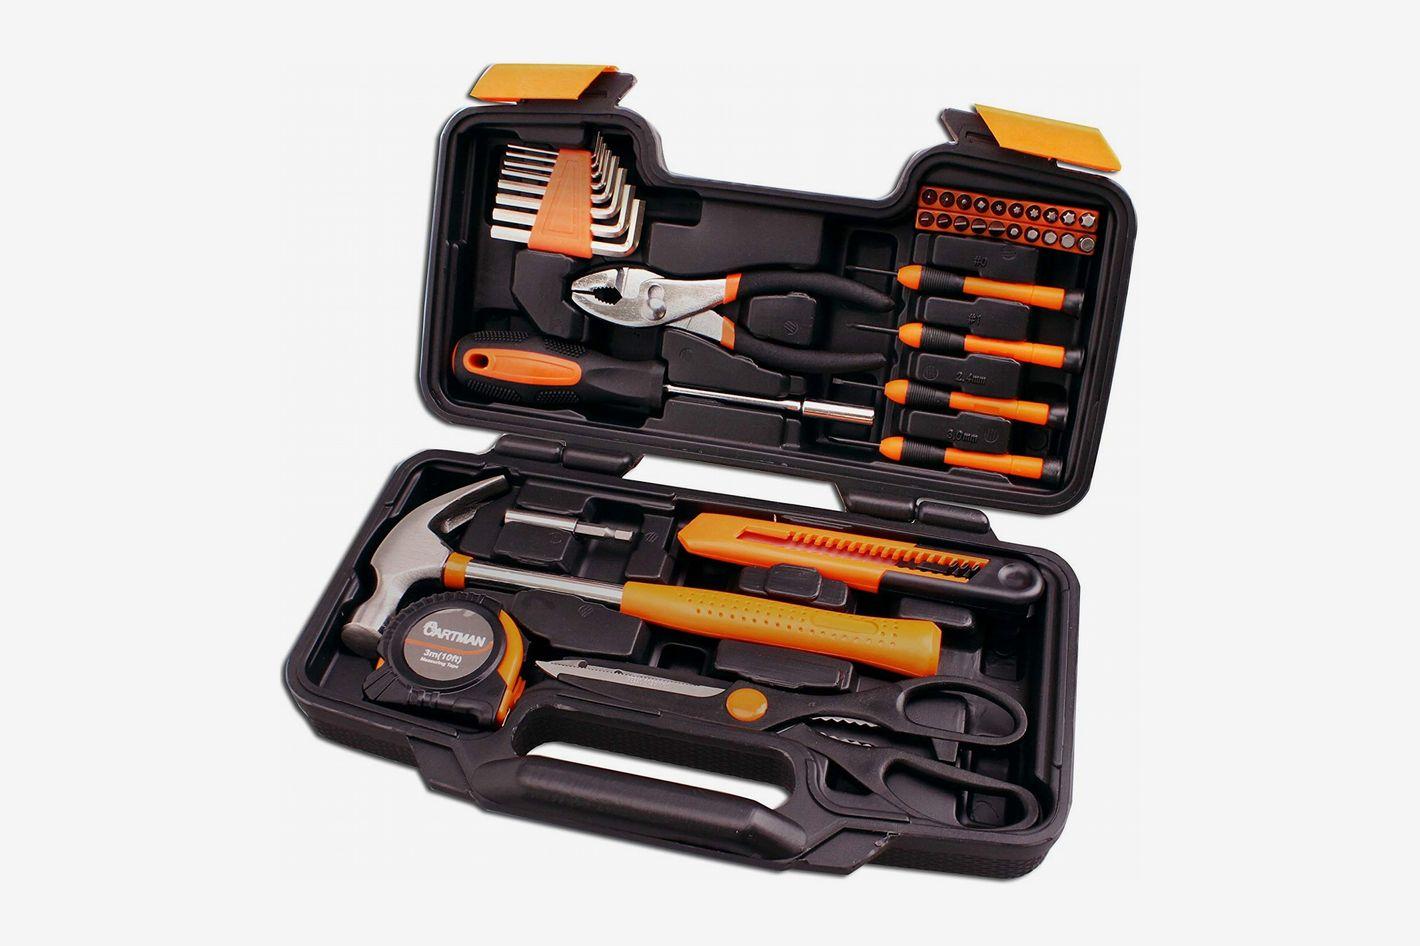 CARTMAN Orange Tool Set, 39-Piece